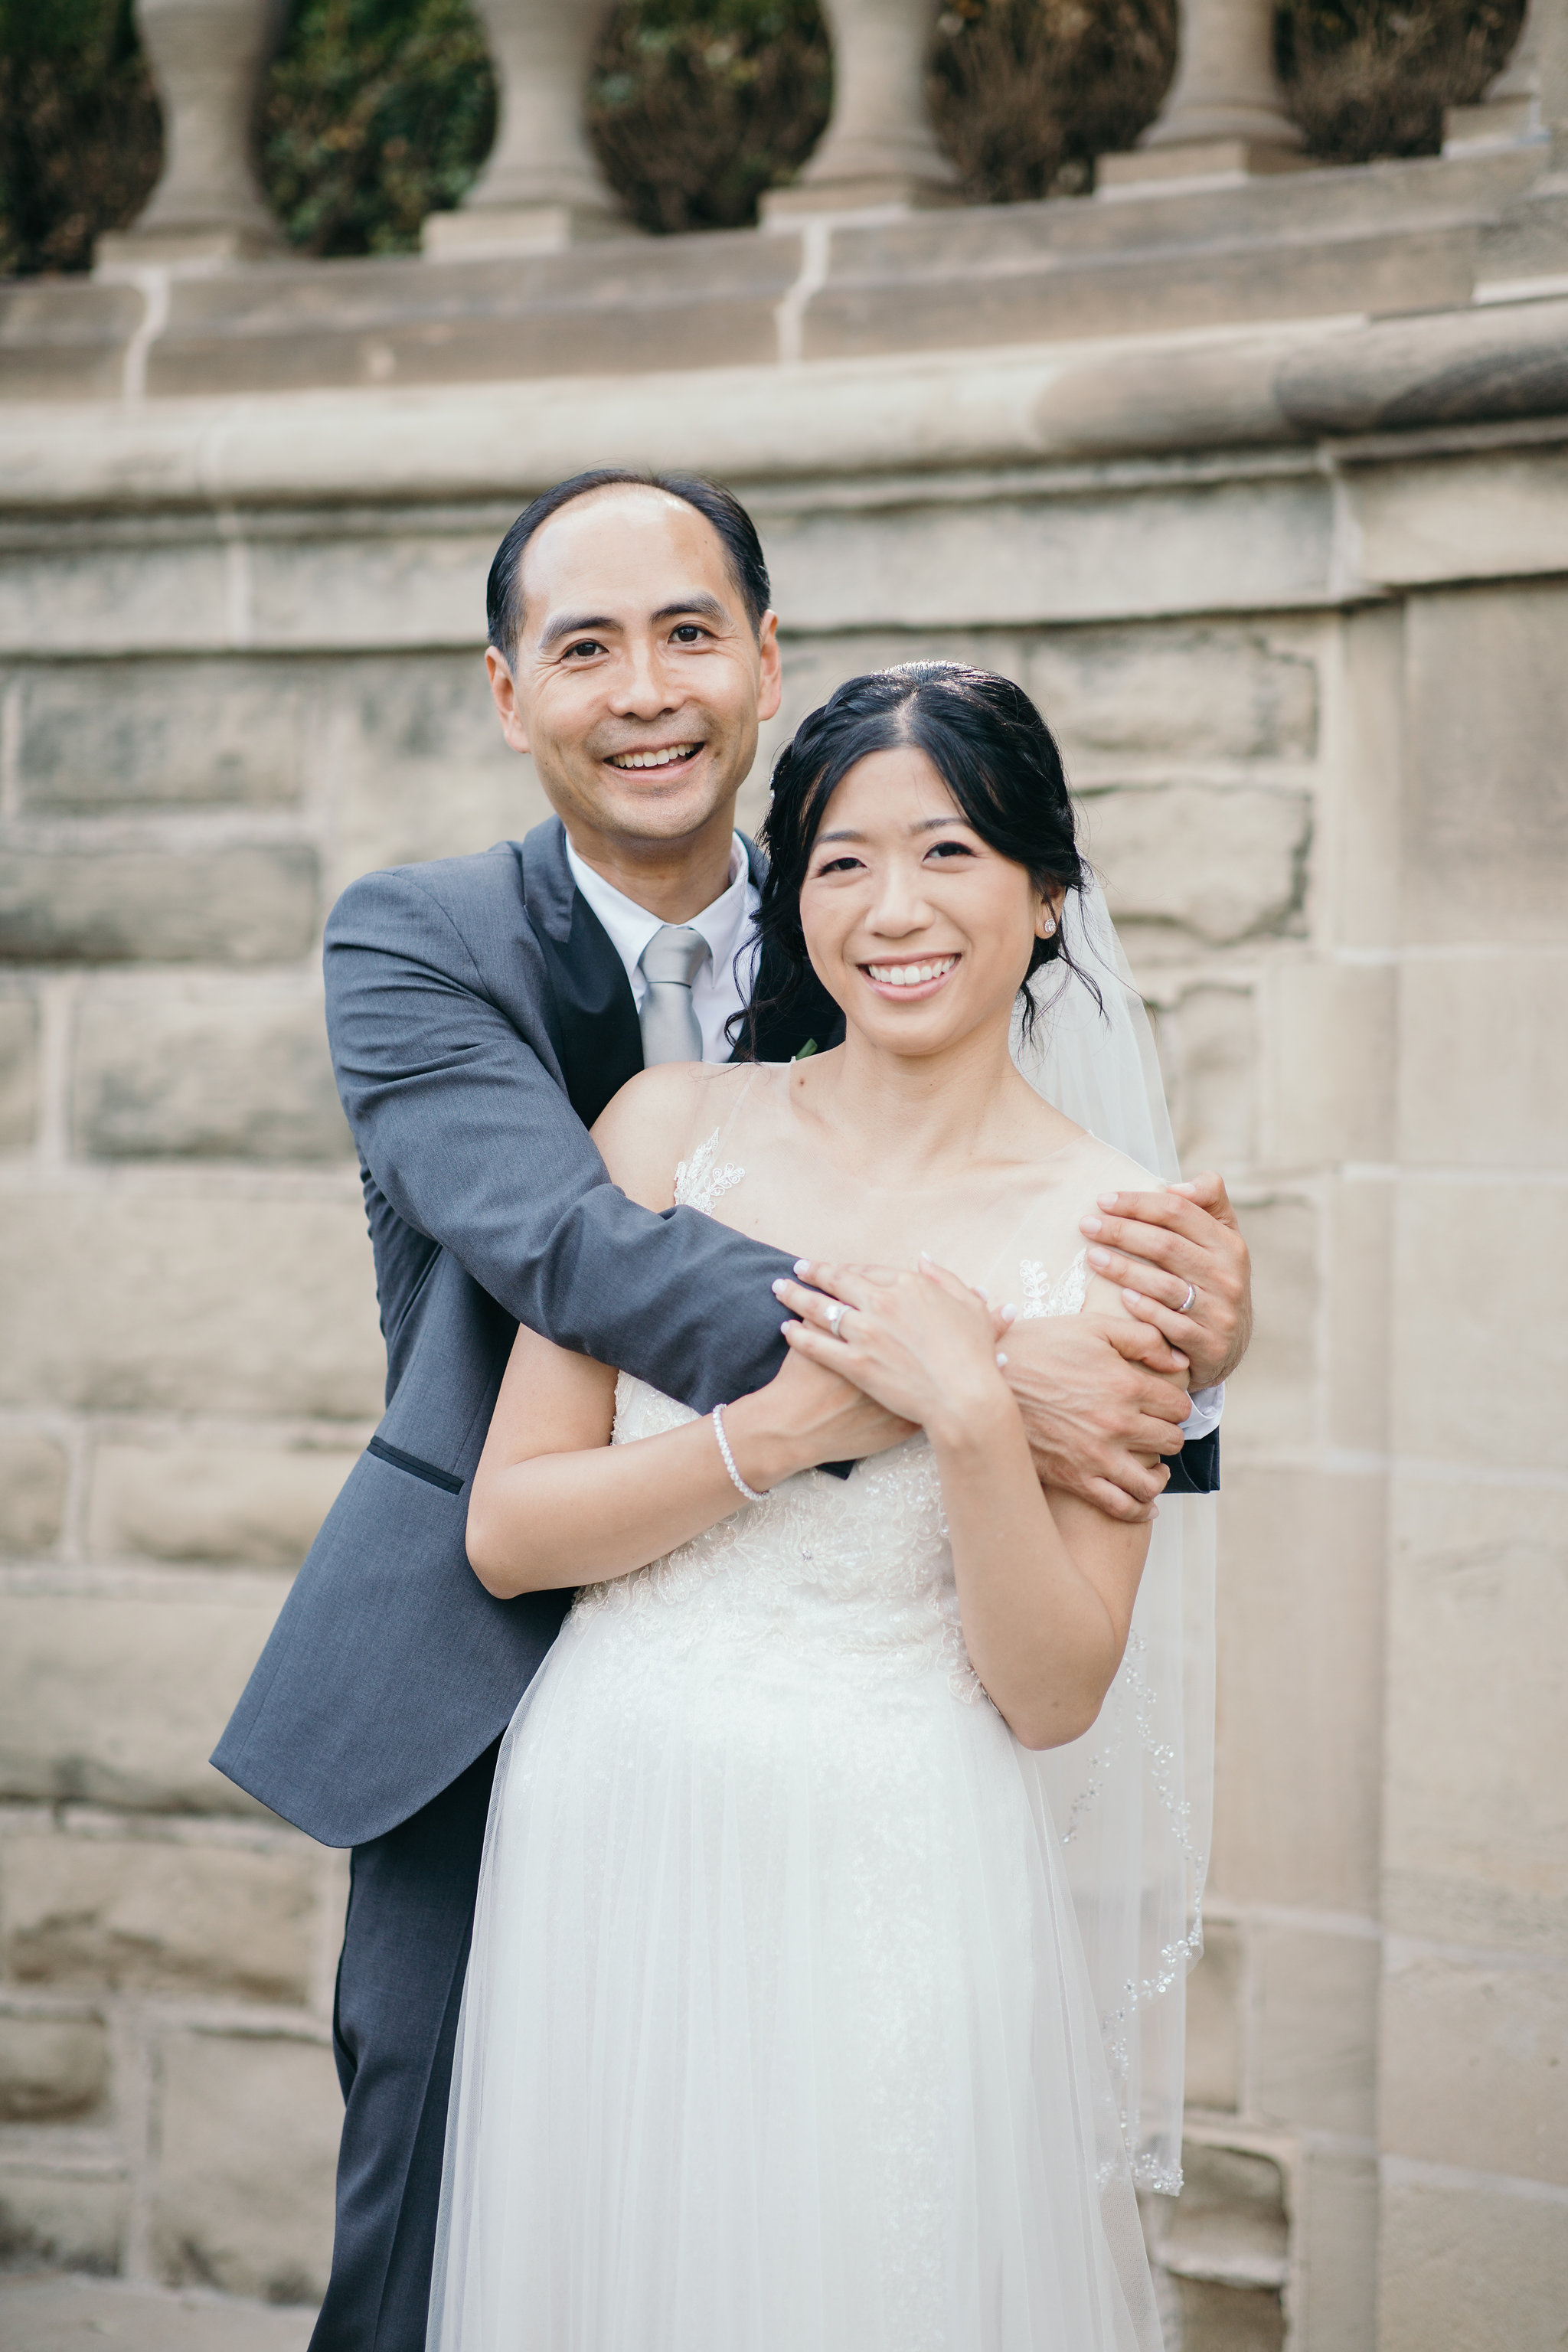 Greystone Mansion  7 Wedding Photography Joy Theory Co Los Angeles Wedding Photographer